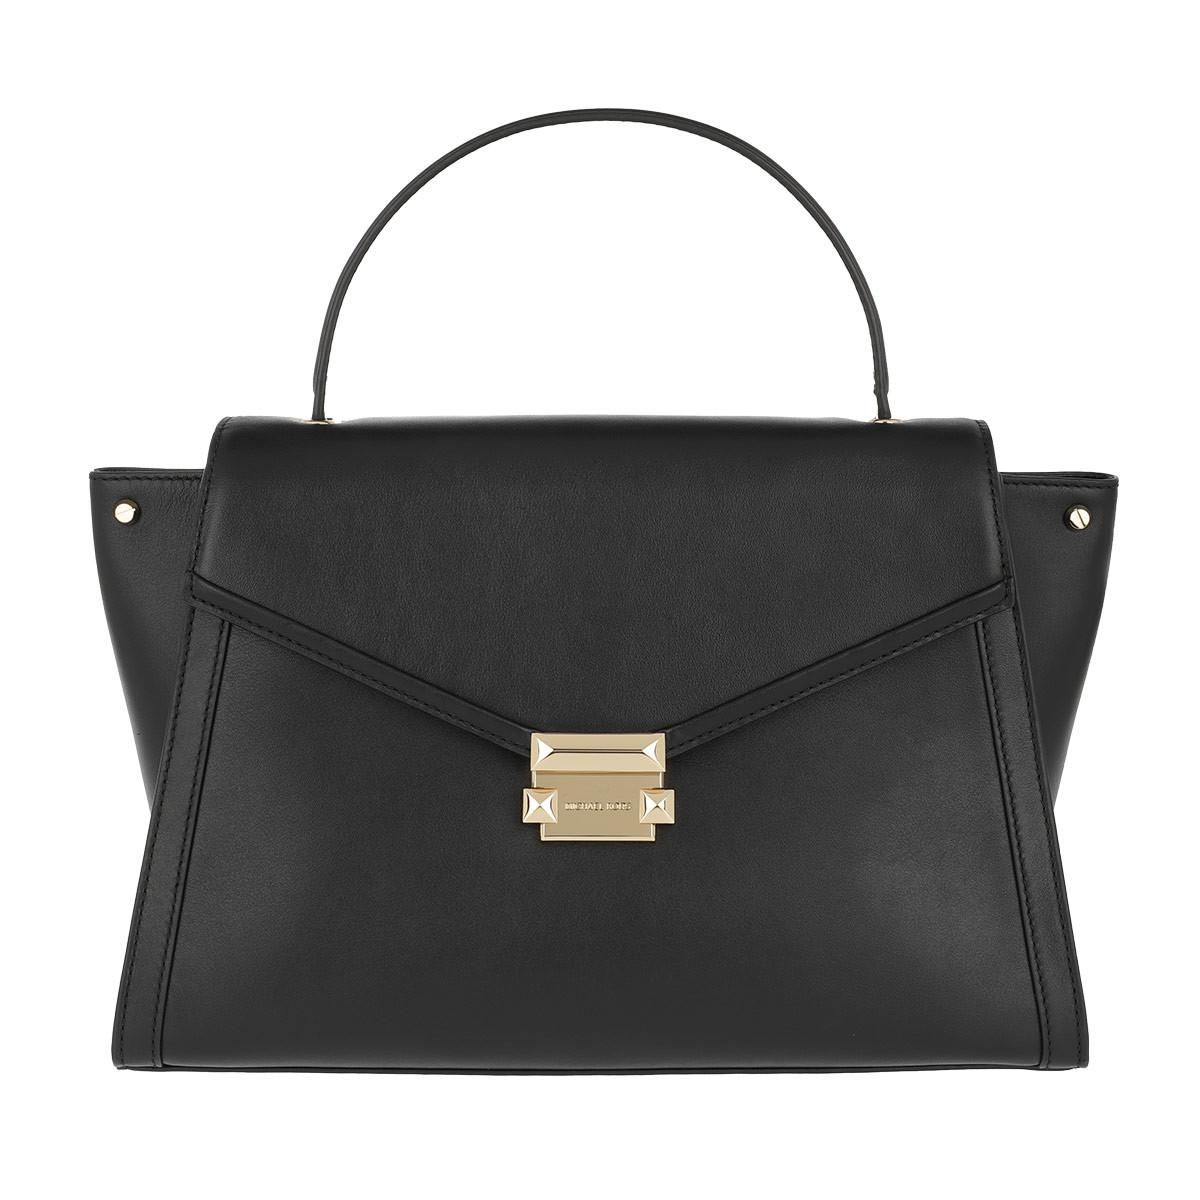 Michael Kors Satchel Bag - Whitney LG TH Satchel Bag Black - in schwarz - für Damen